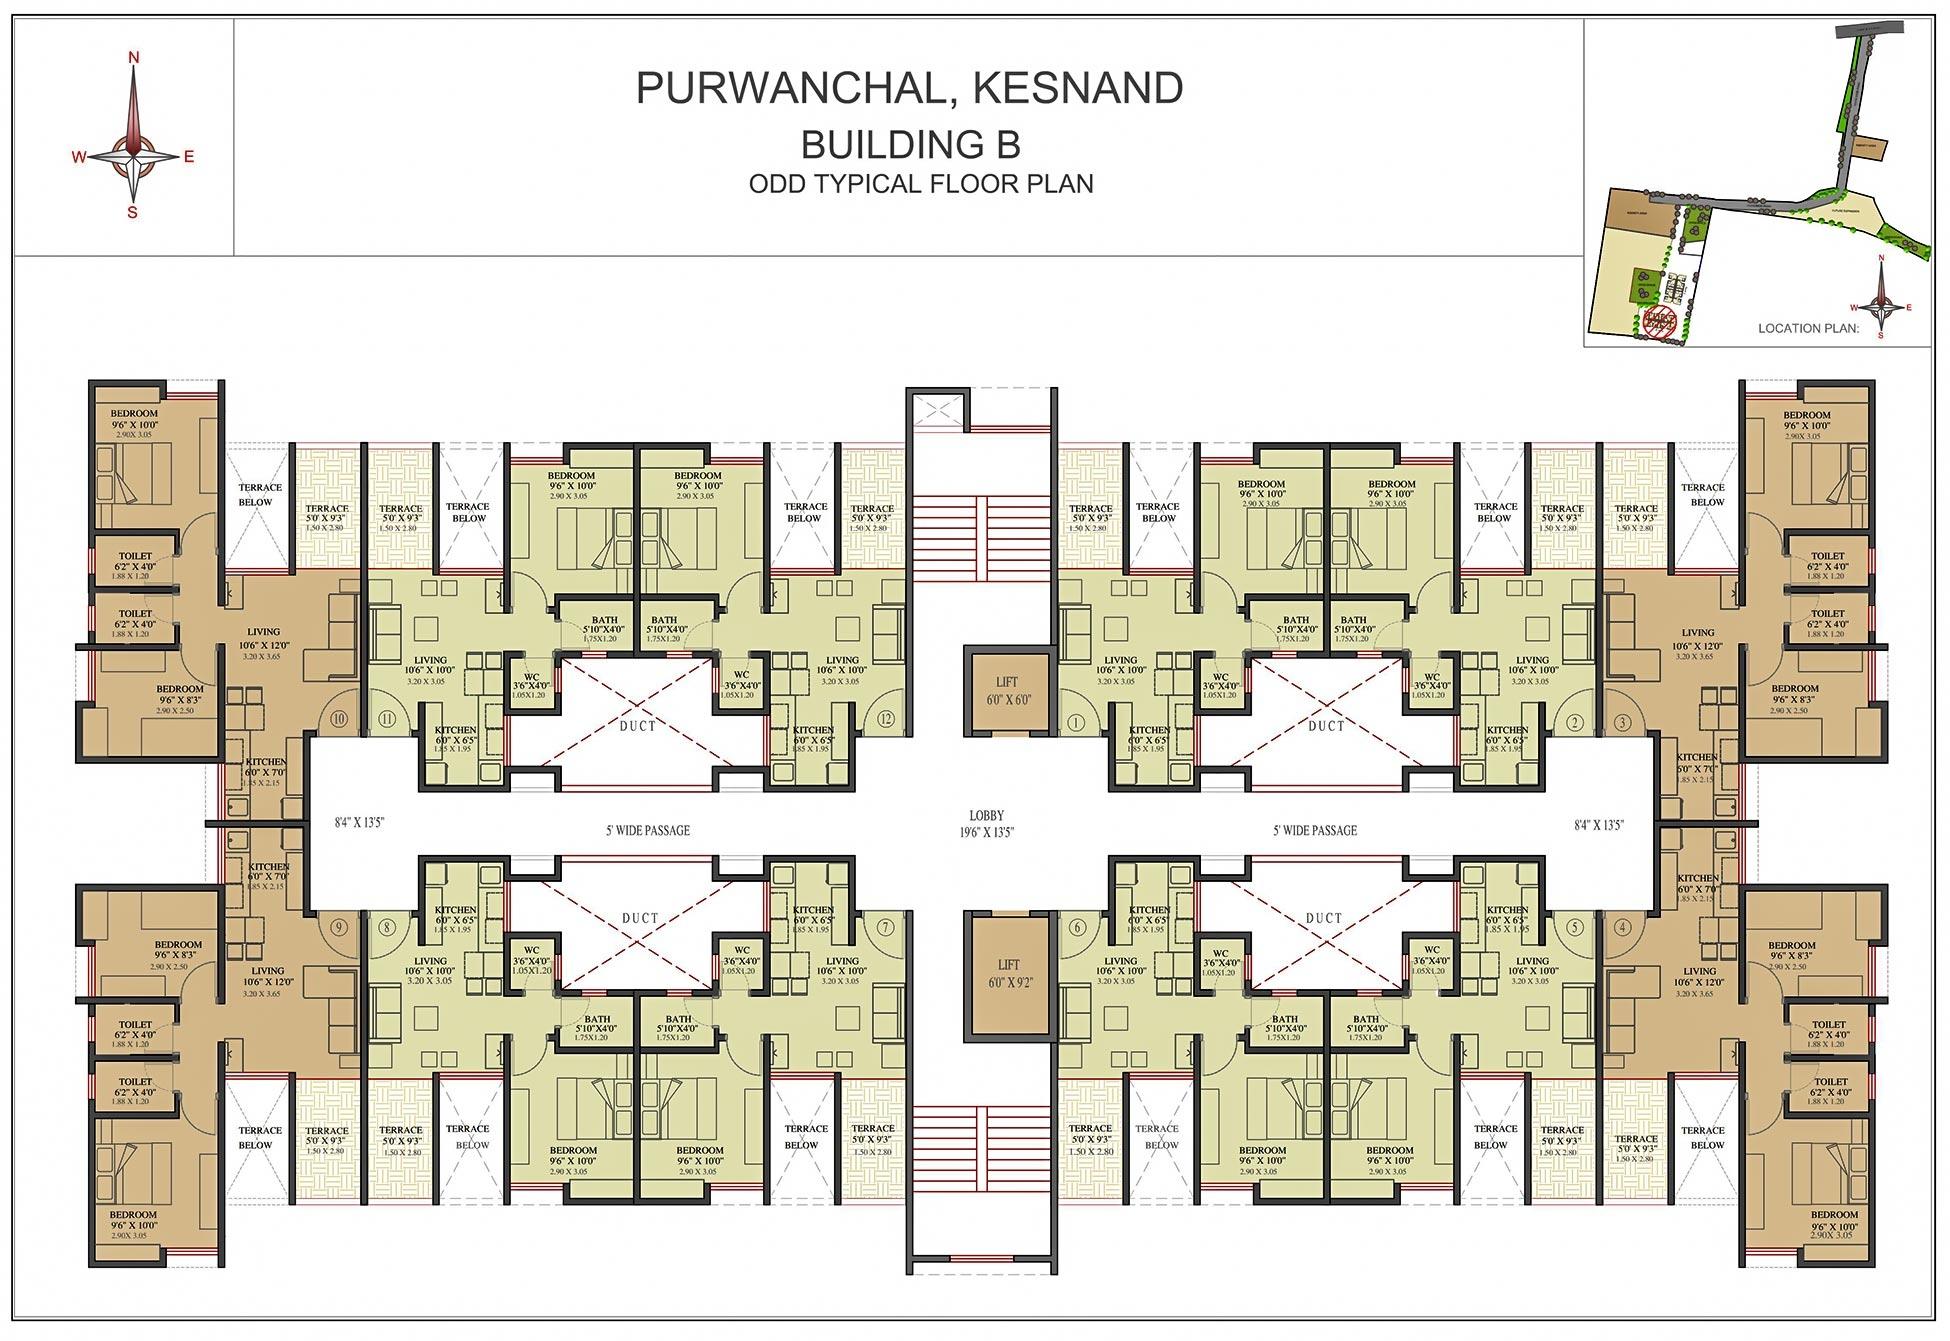 VTP Purvanchal - 1, 2, 3 BHK Affordable Homes at Wagholi, Pune ...